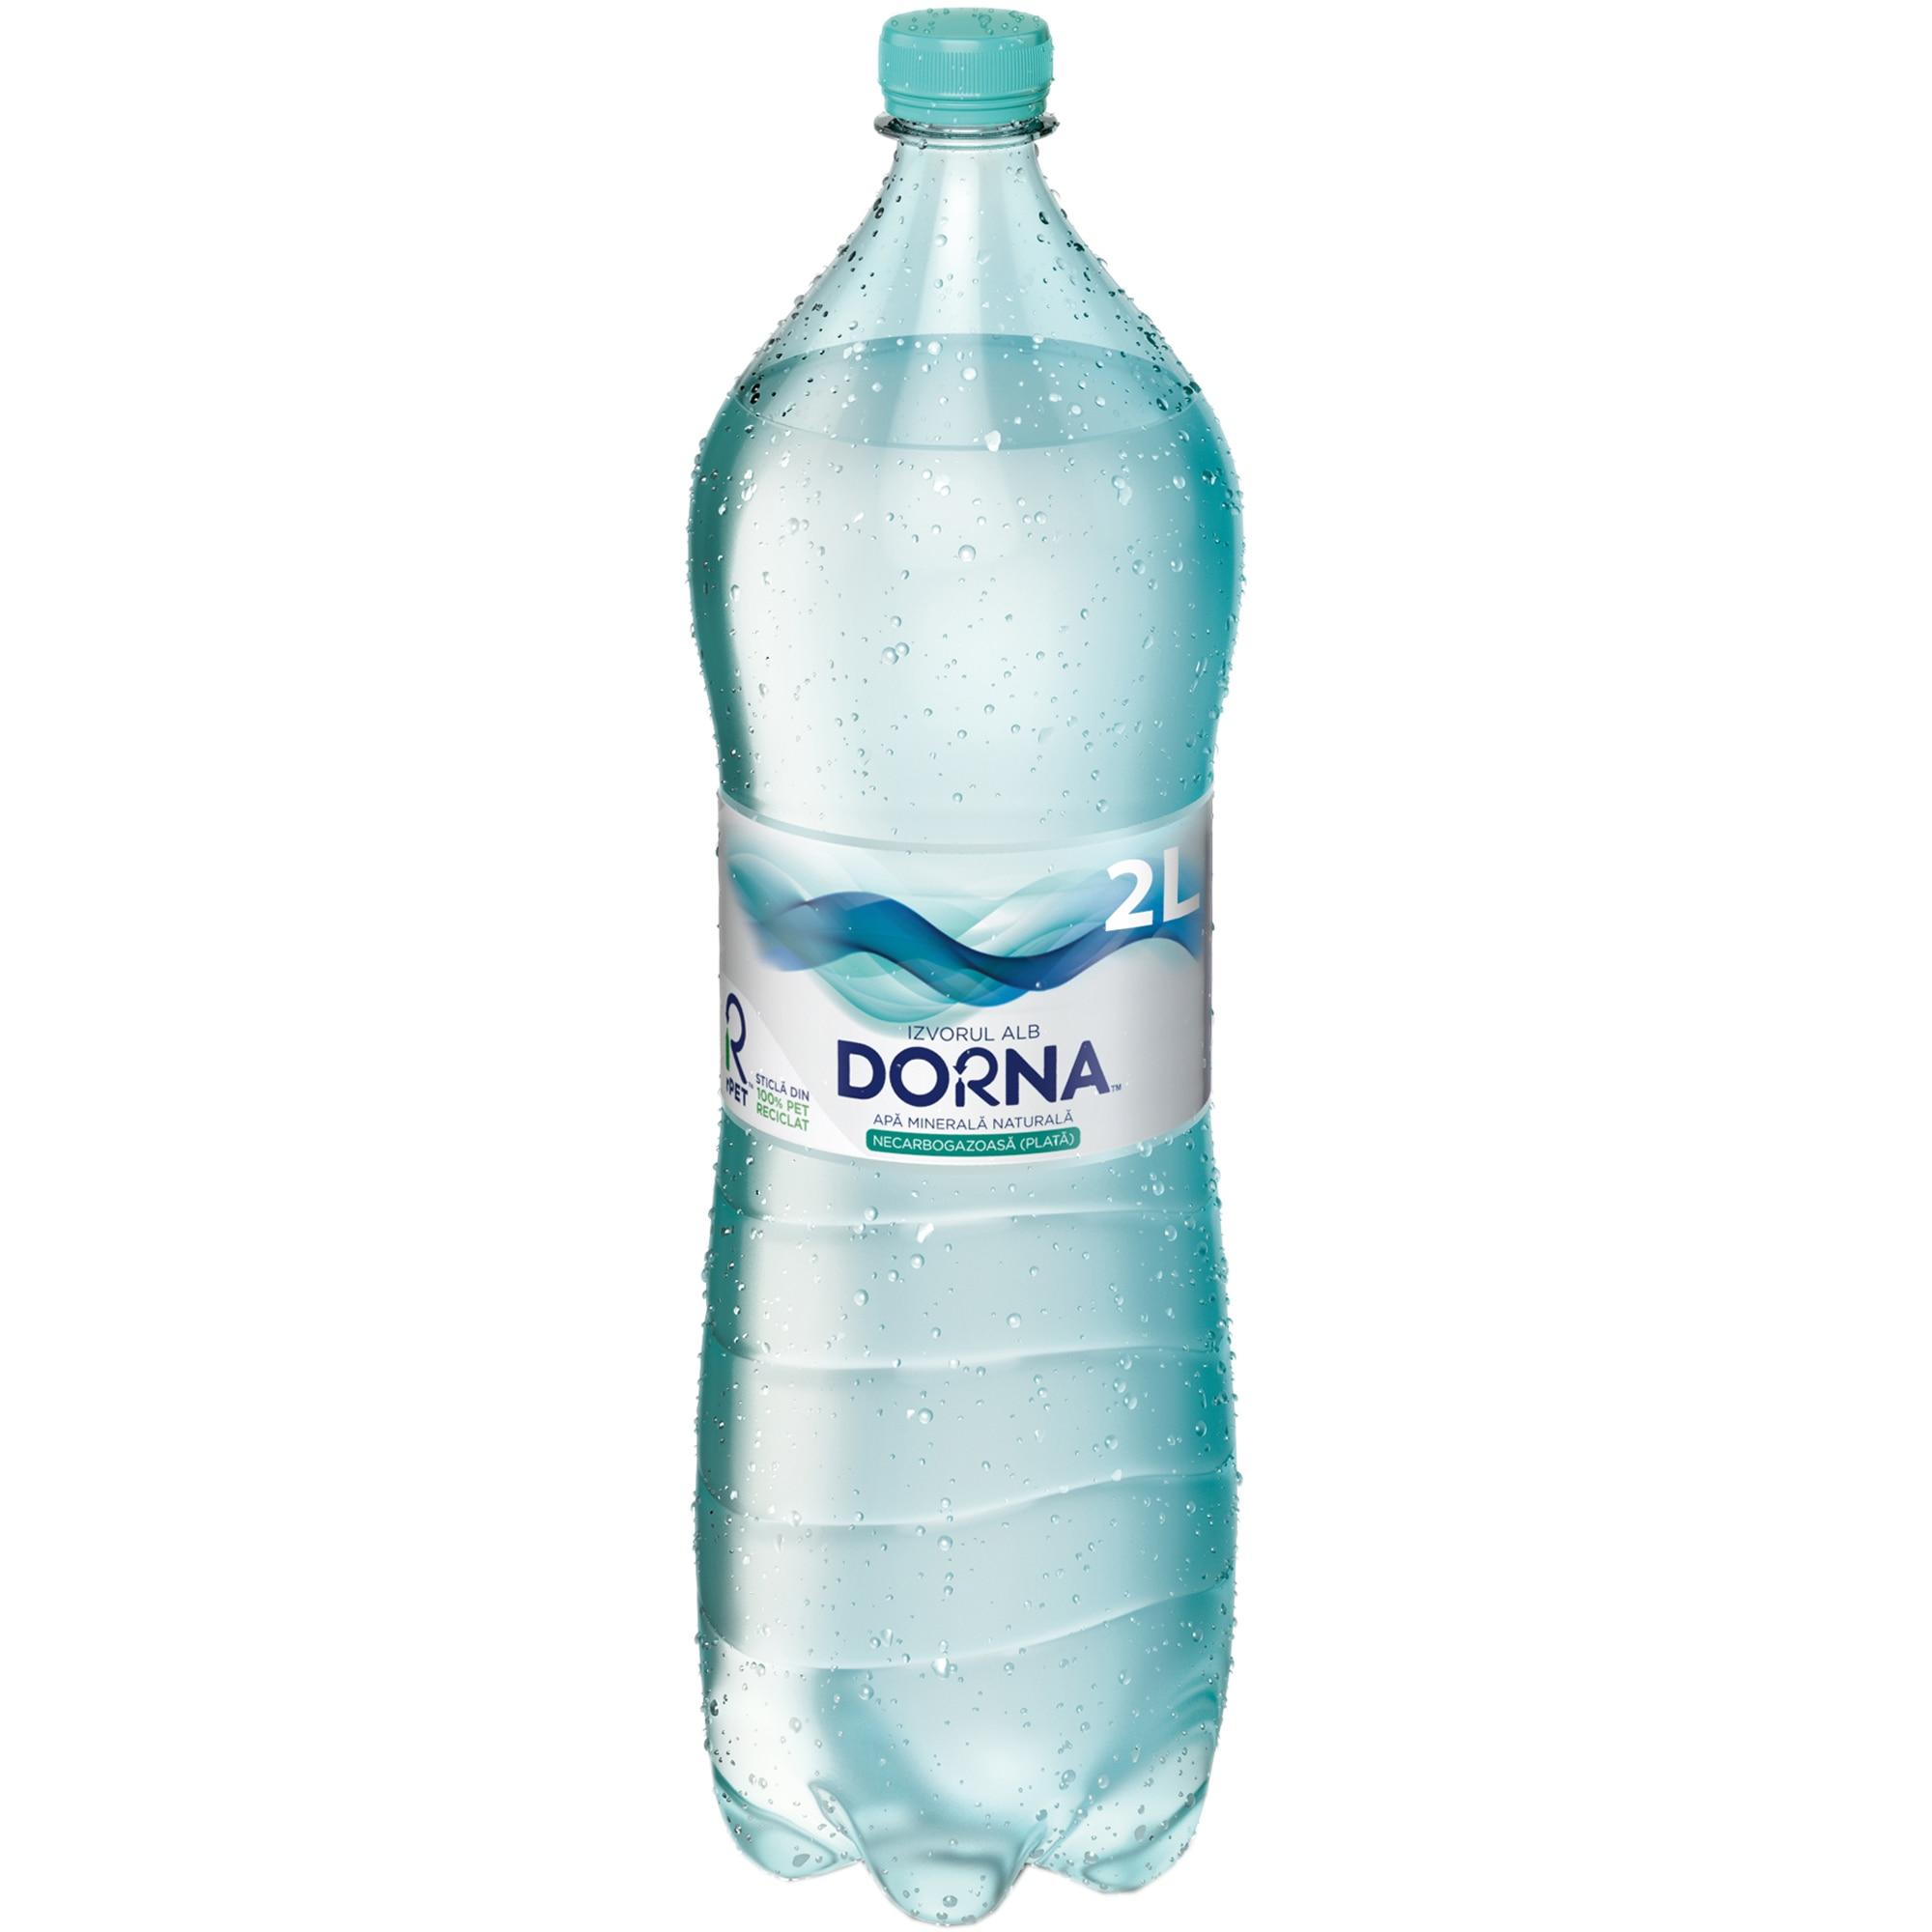 Borsec apa minerala plata sticla l | Lei/buc | rezolvaripbinfo.ro